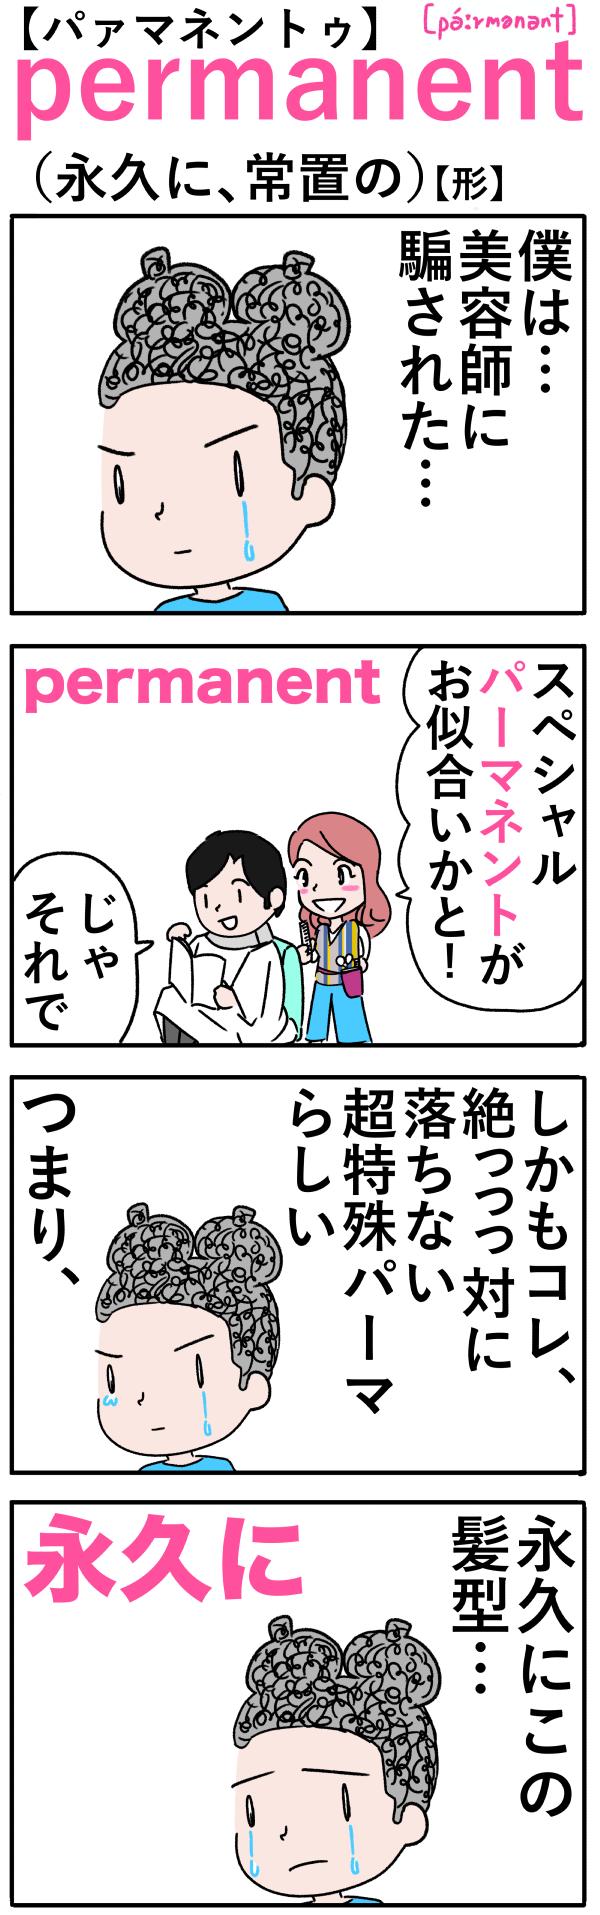 permanent(永久に)の語呂合わせ英単語